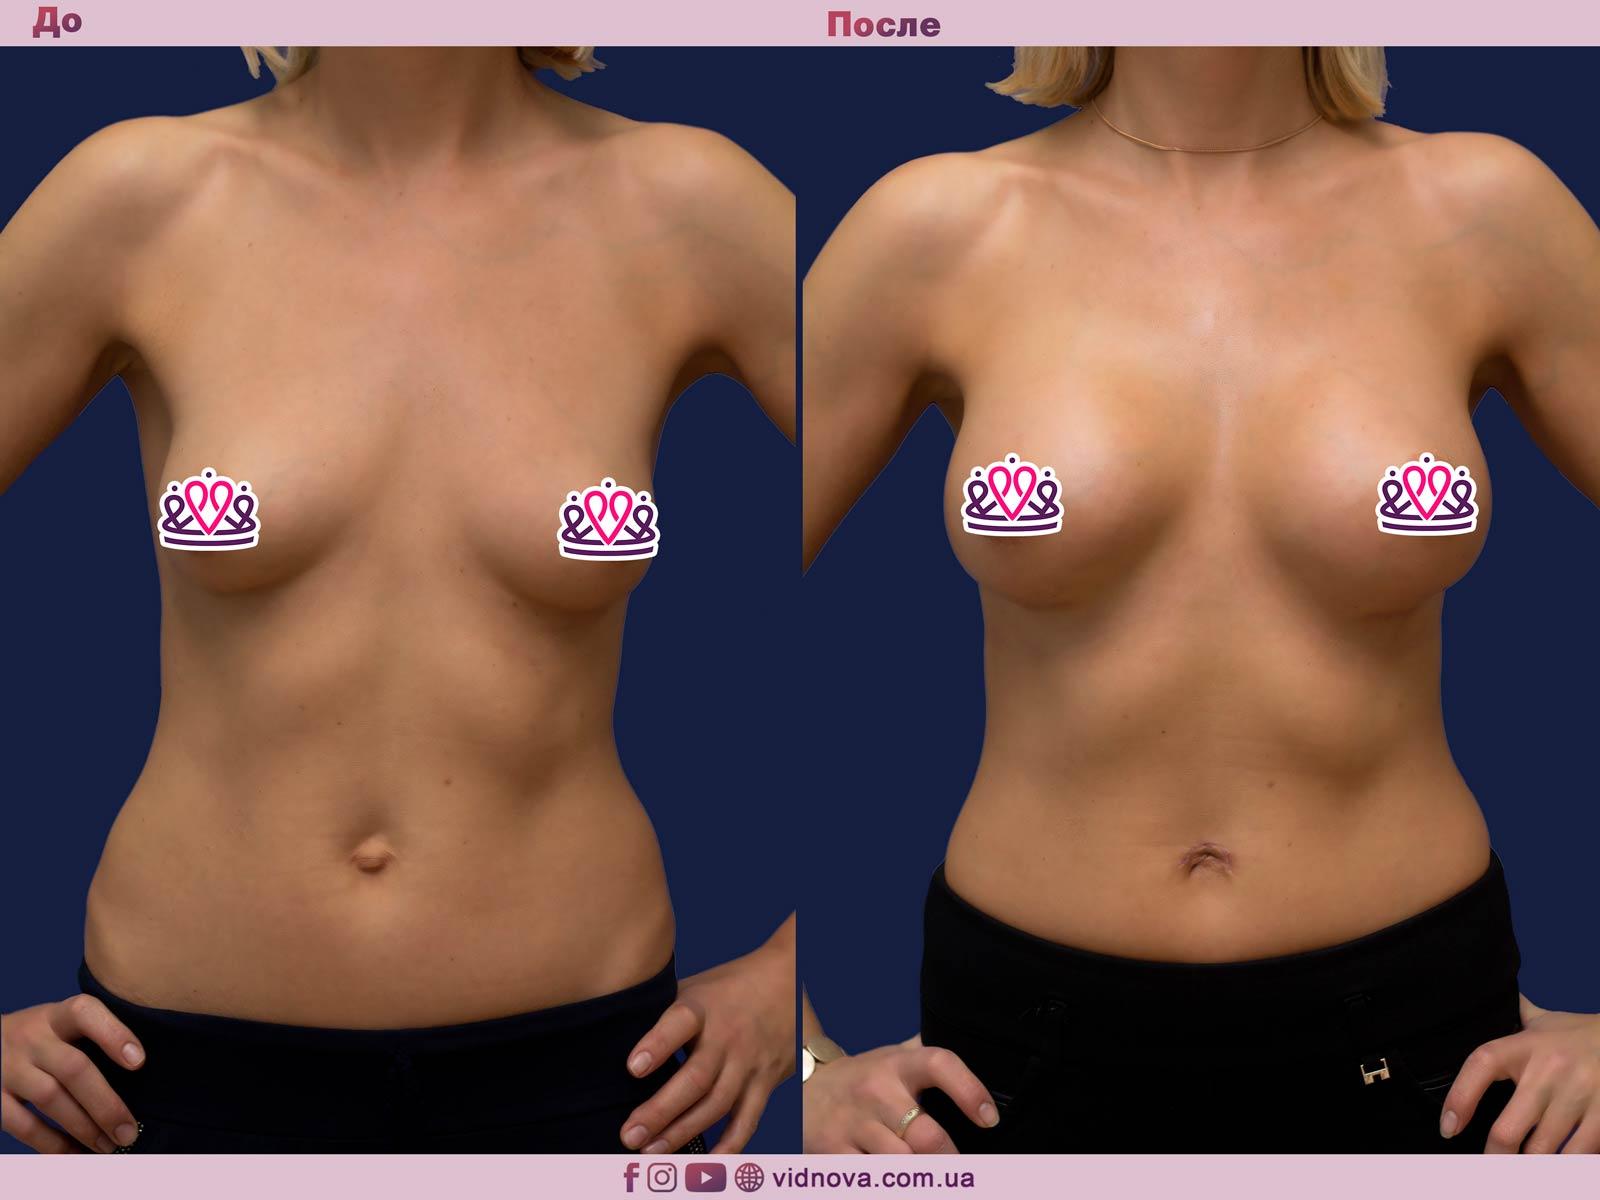 Увеличение груди: Фото ДО и ПОСЛЕ - Пример №81-1 - Клиника Vidnova